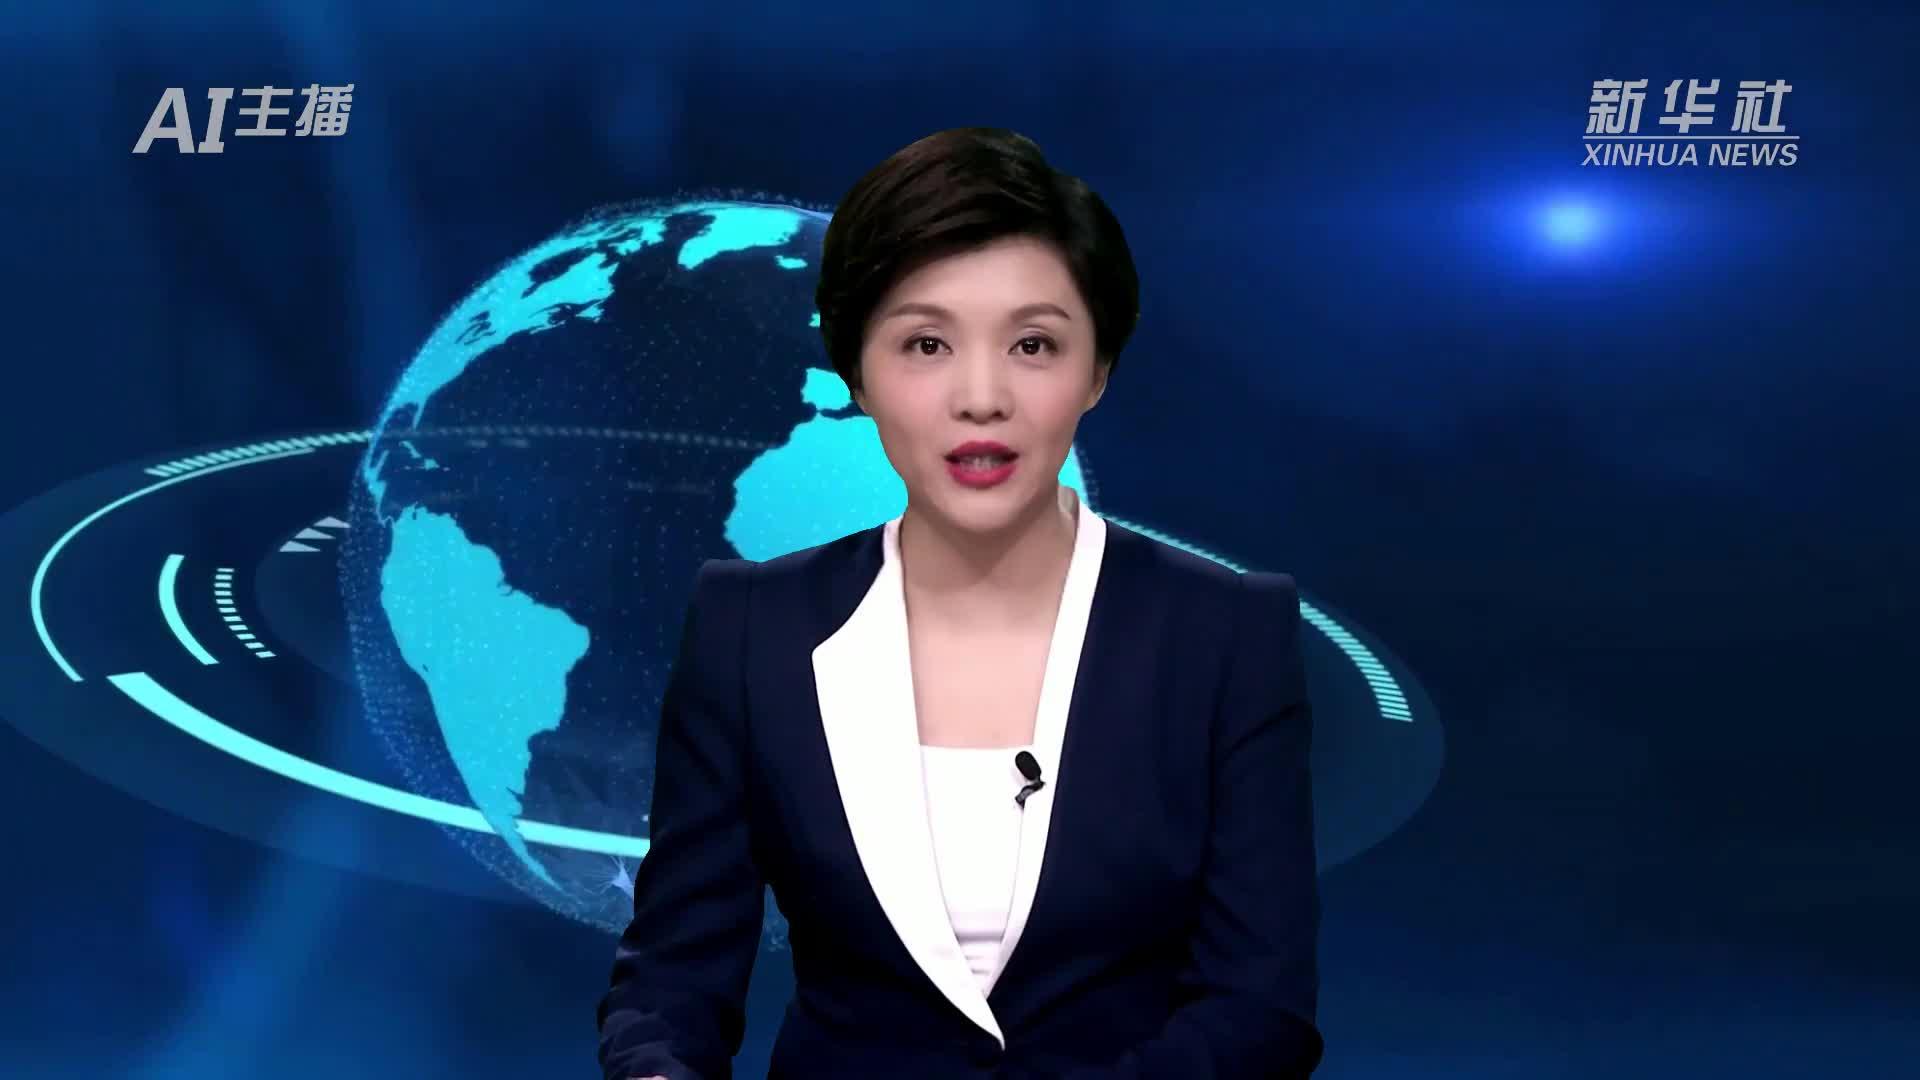 AI合成主播|中国海警成功破获一起特大海上成品油走私案